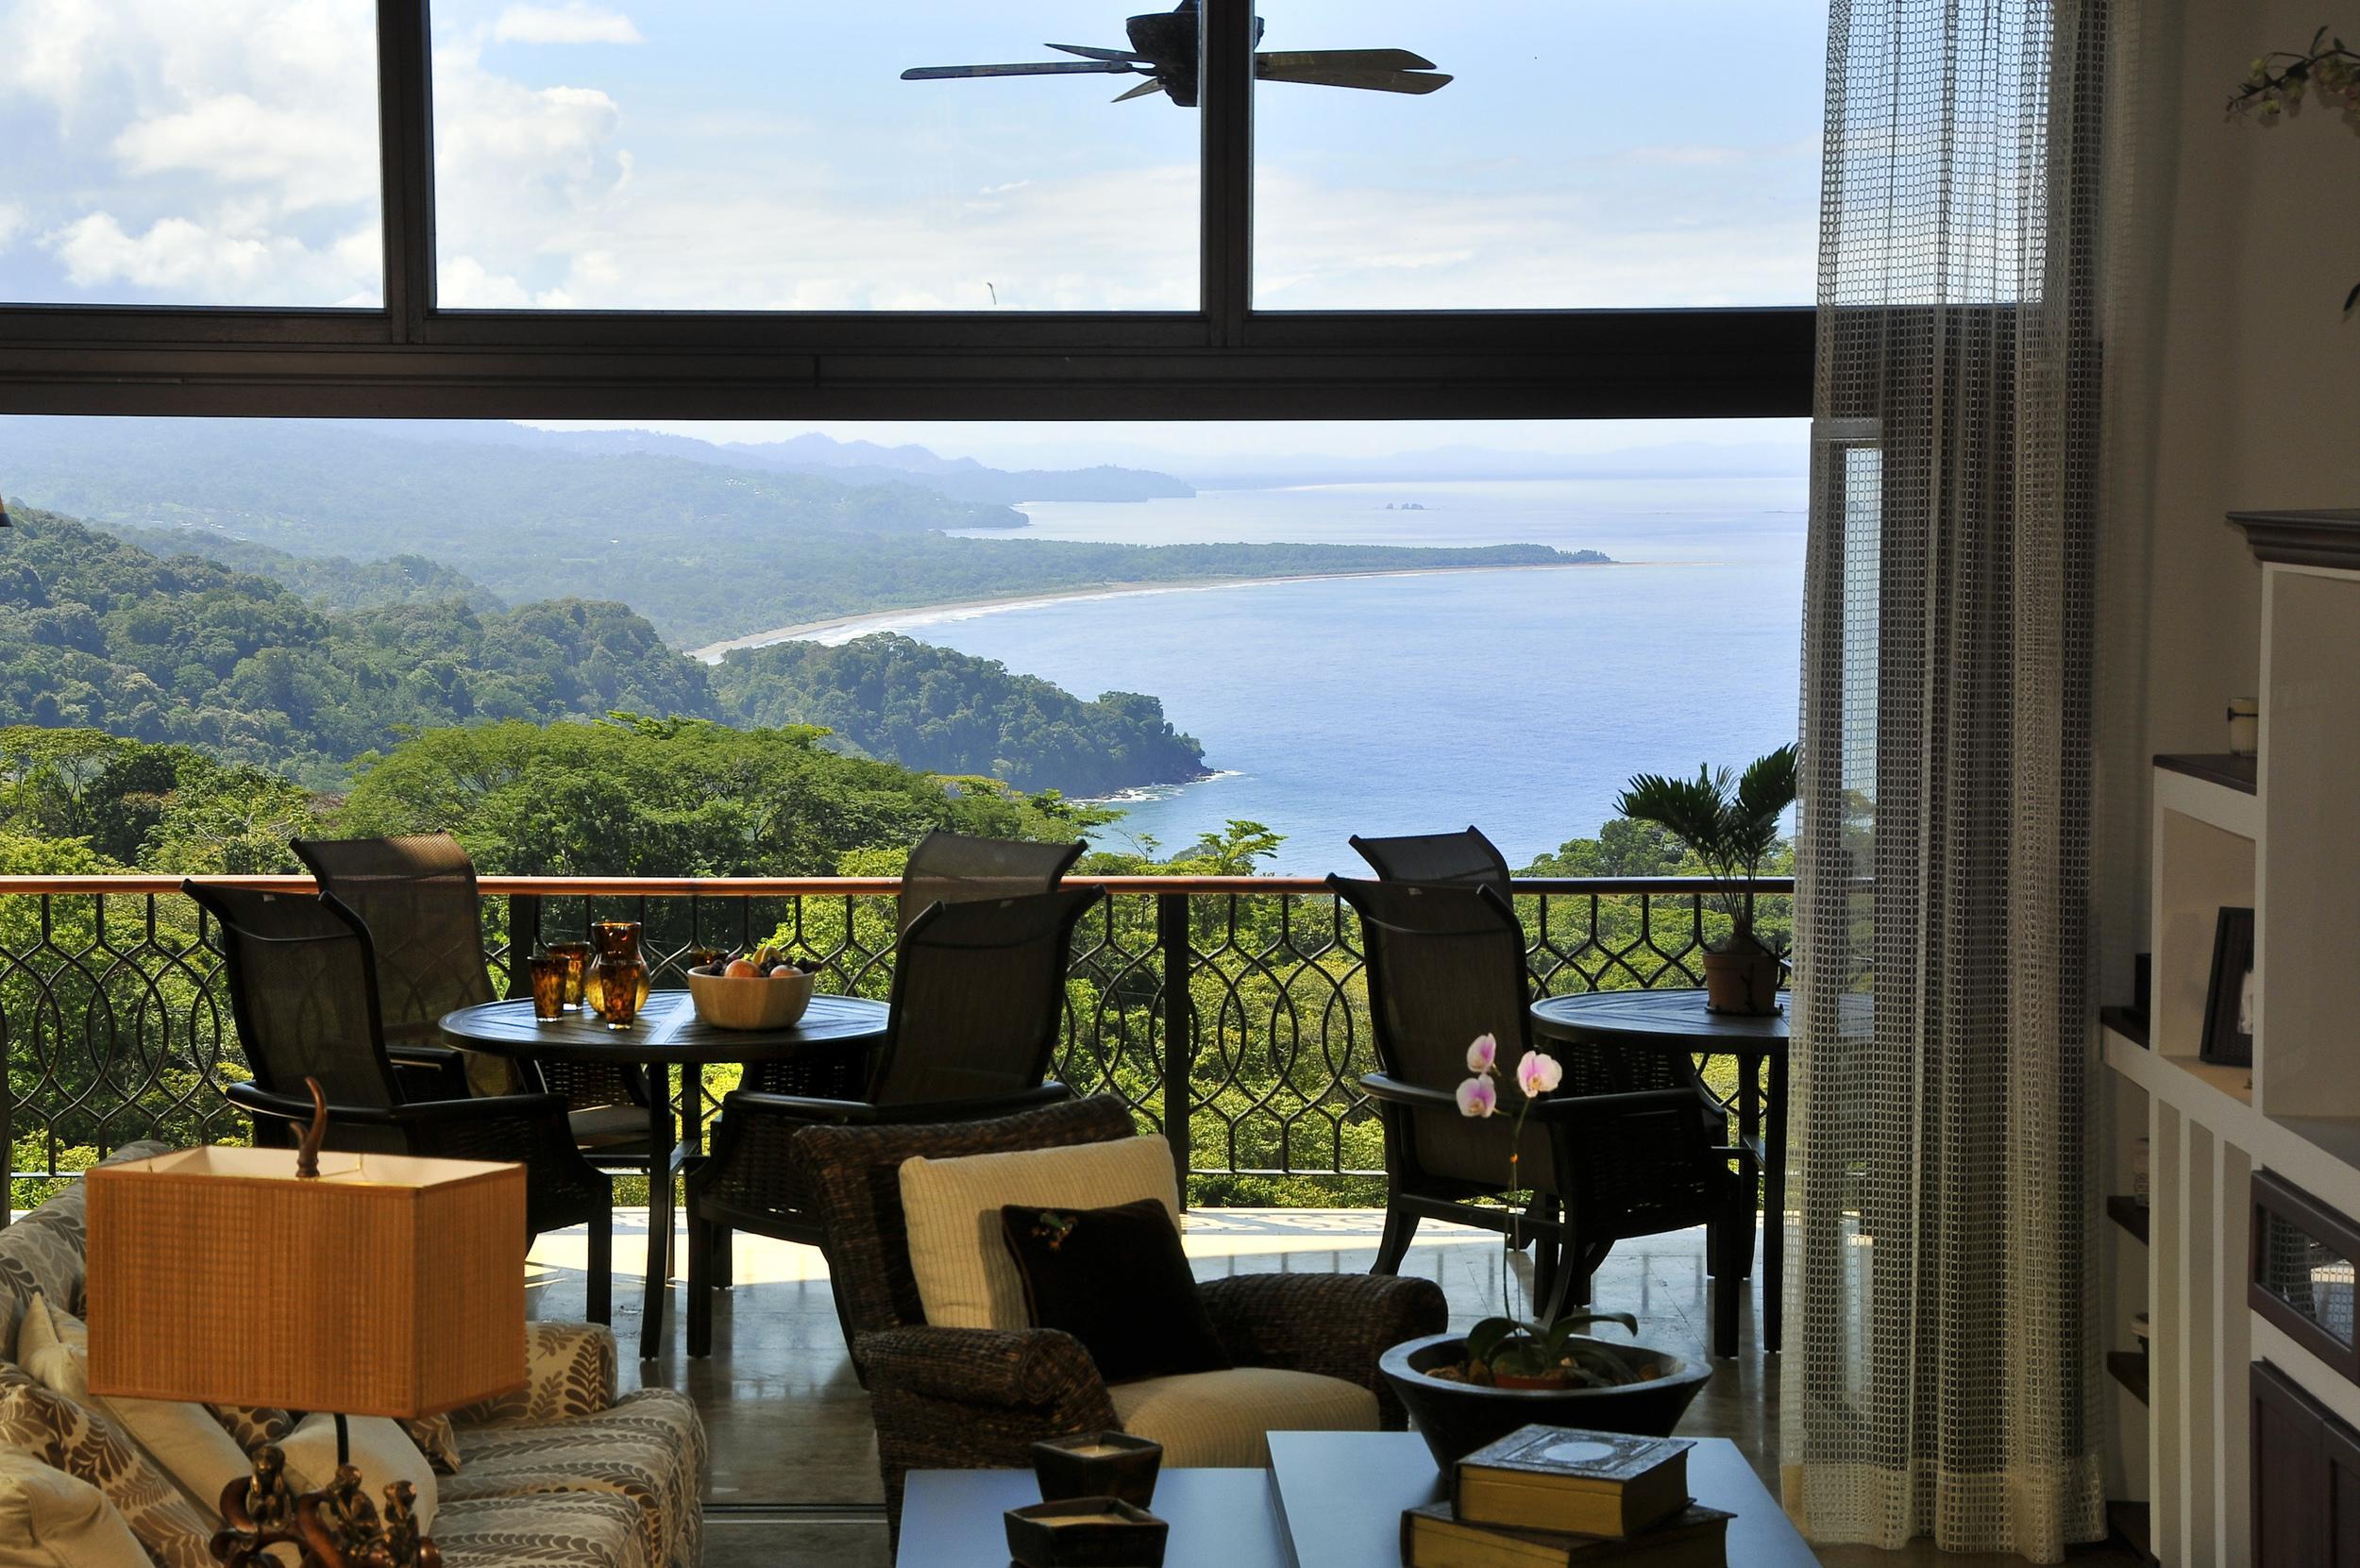 flex5-yoga-retreat-costa-rica-living-room-ocean-view.jpg